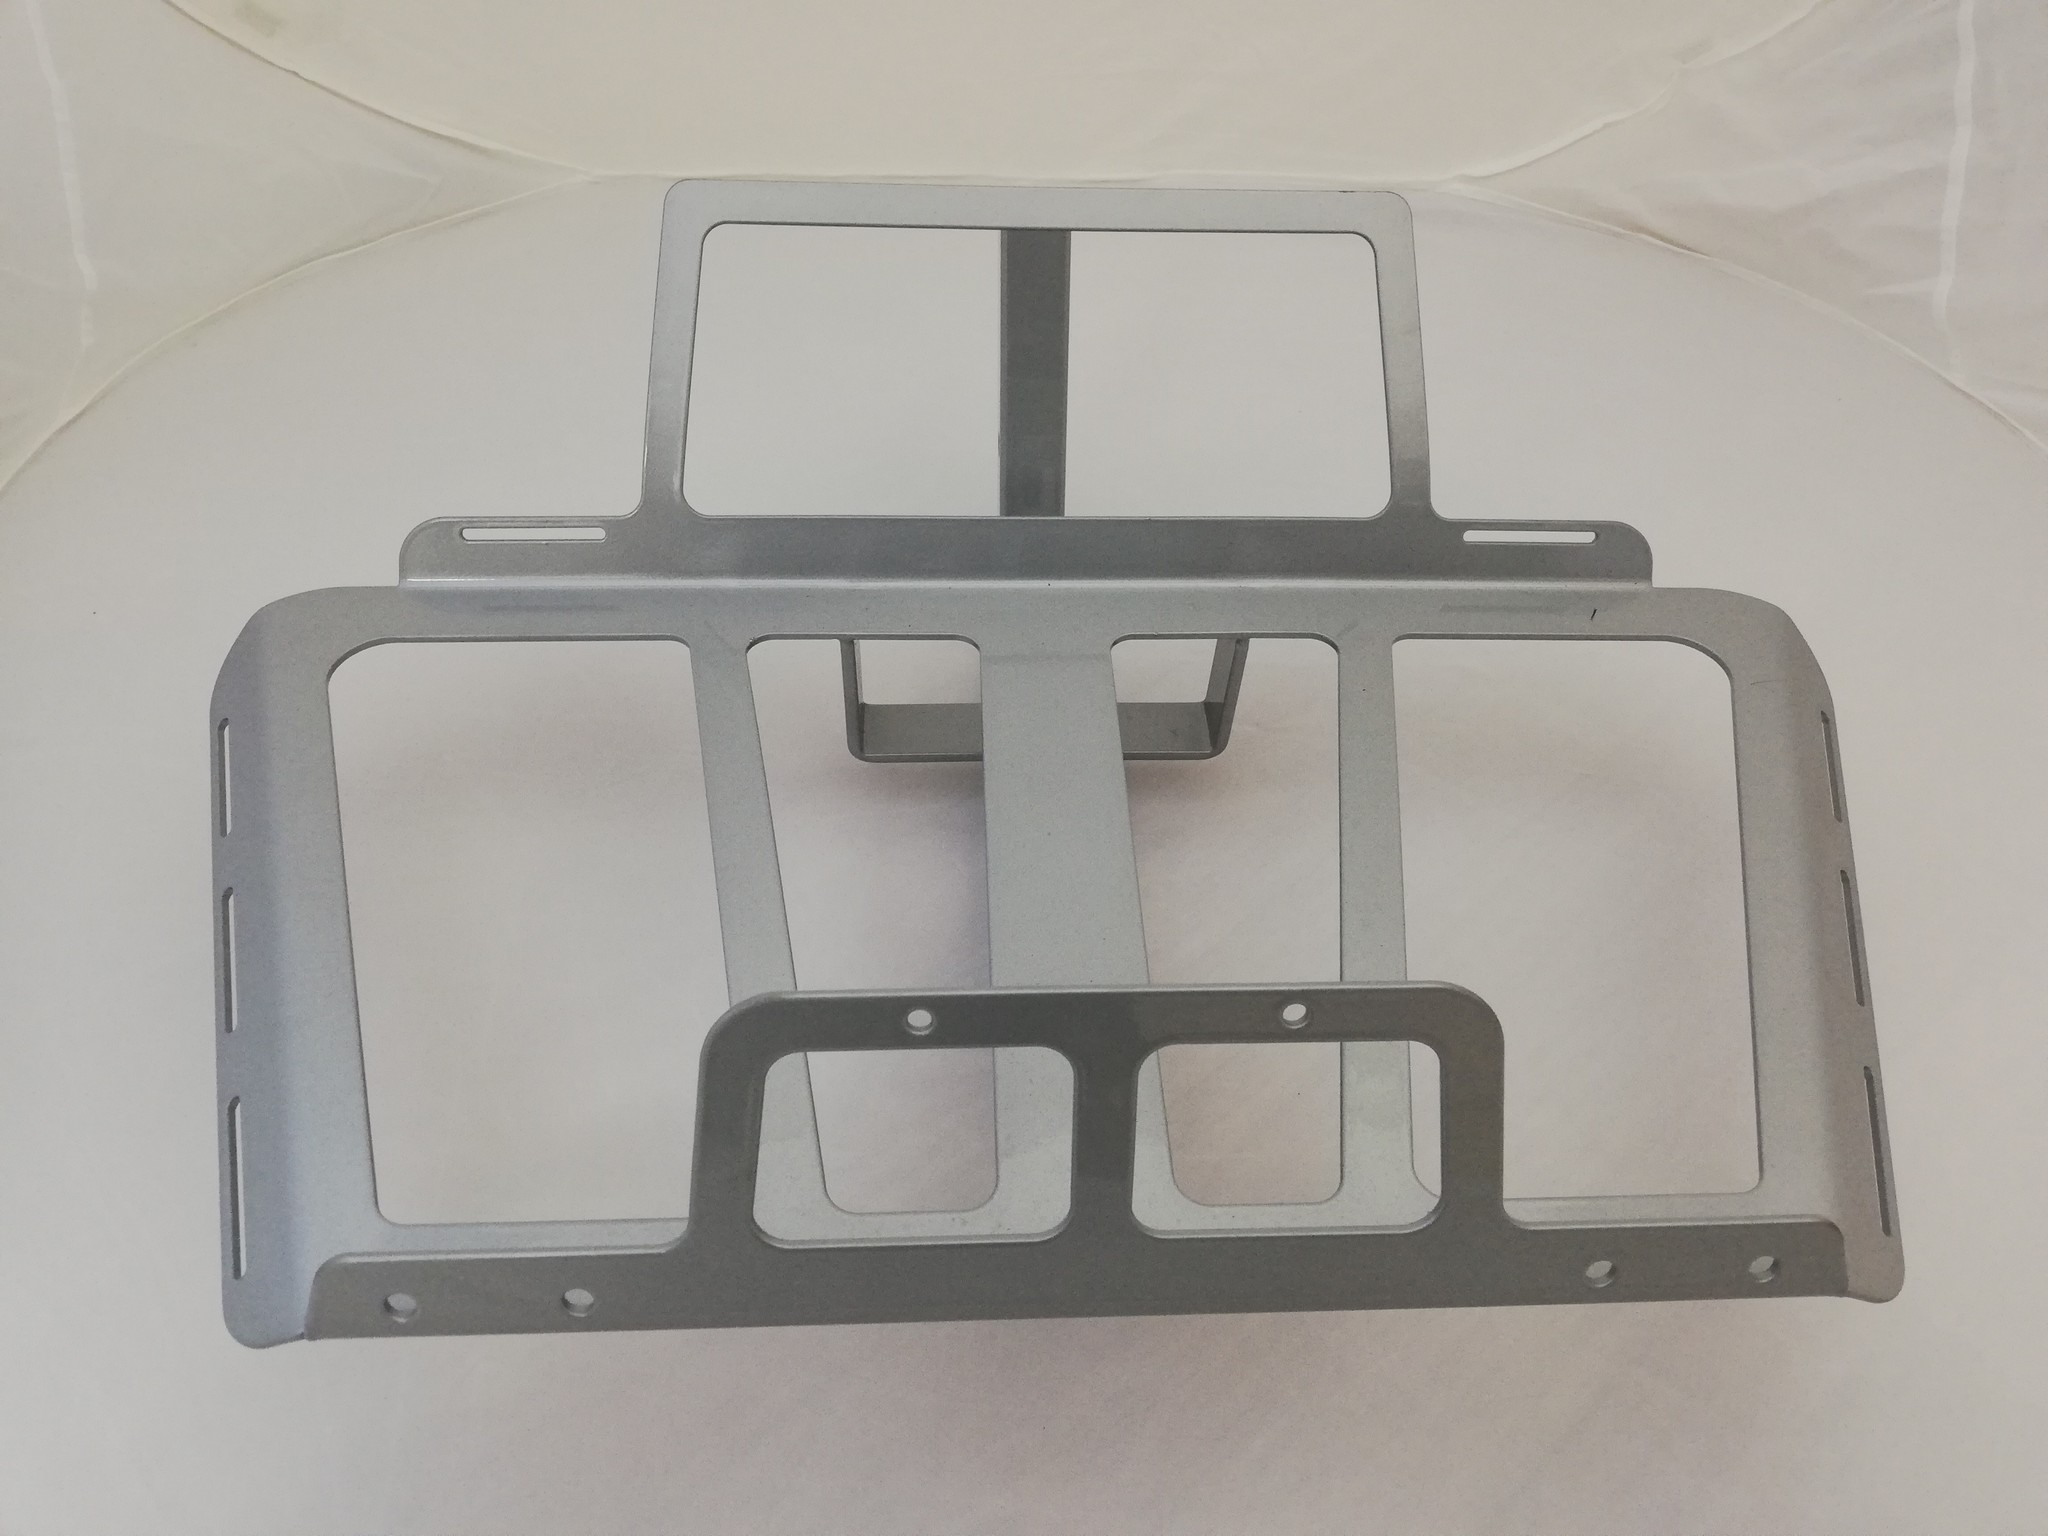 JVR Products Slide-in rack GL1800 model 2018 silver gray